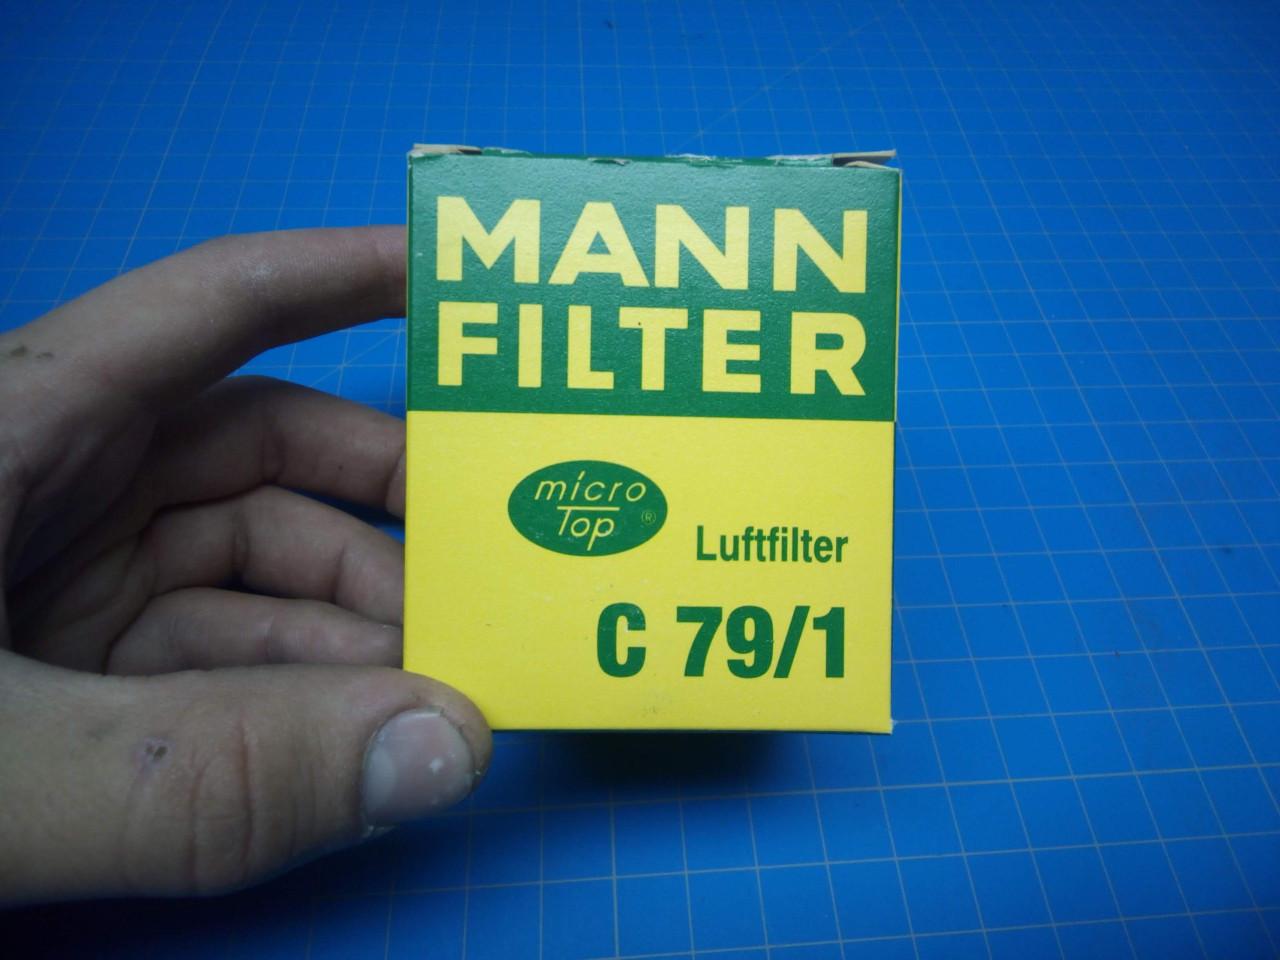 Mann Filter C79/1 - P02-000248